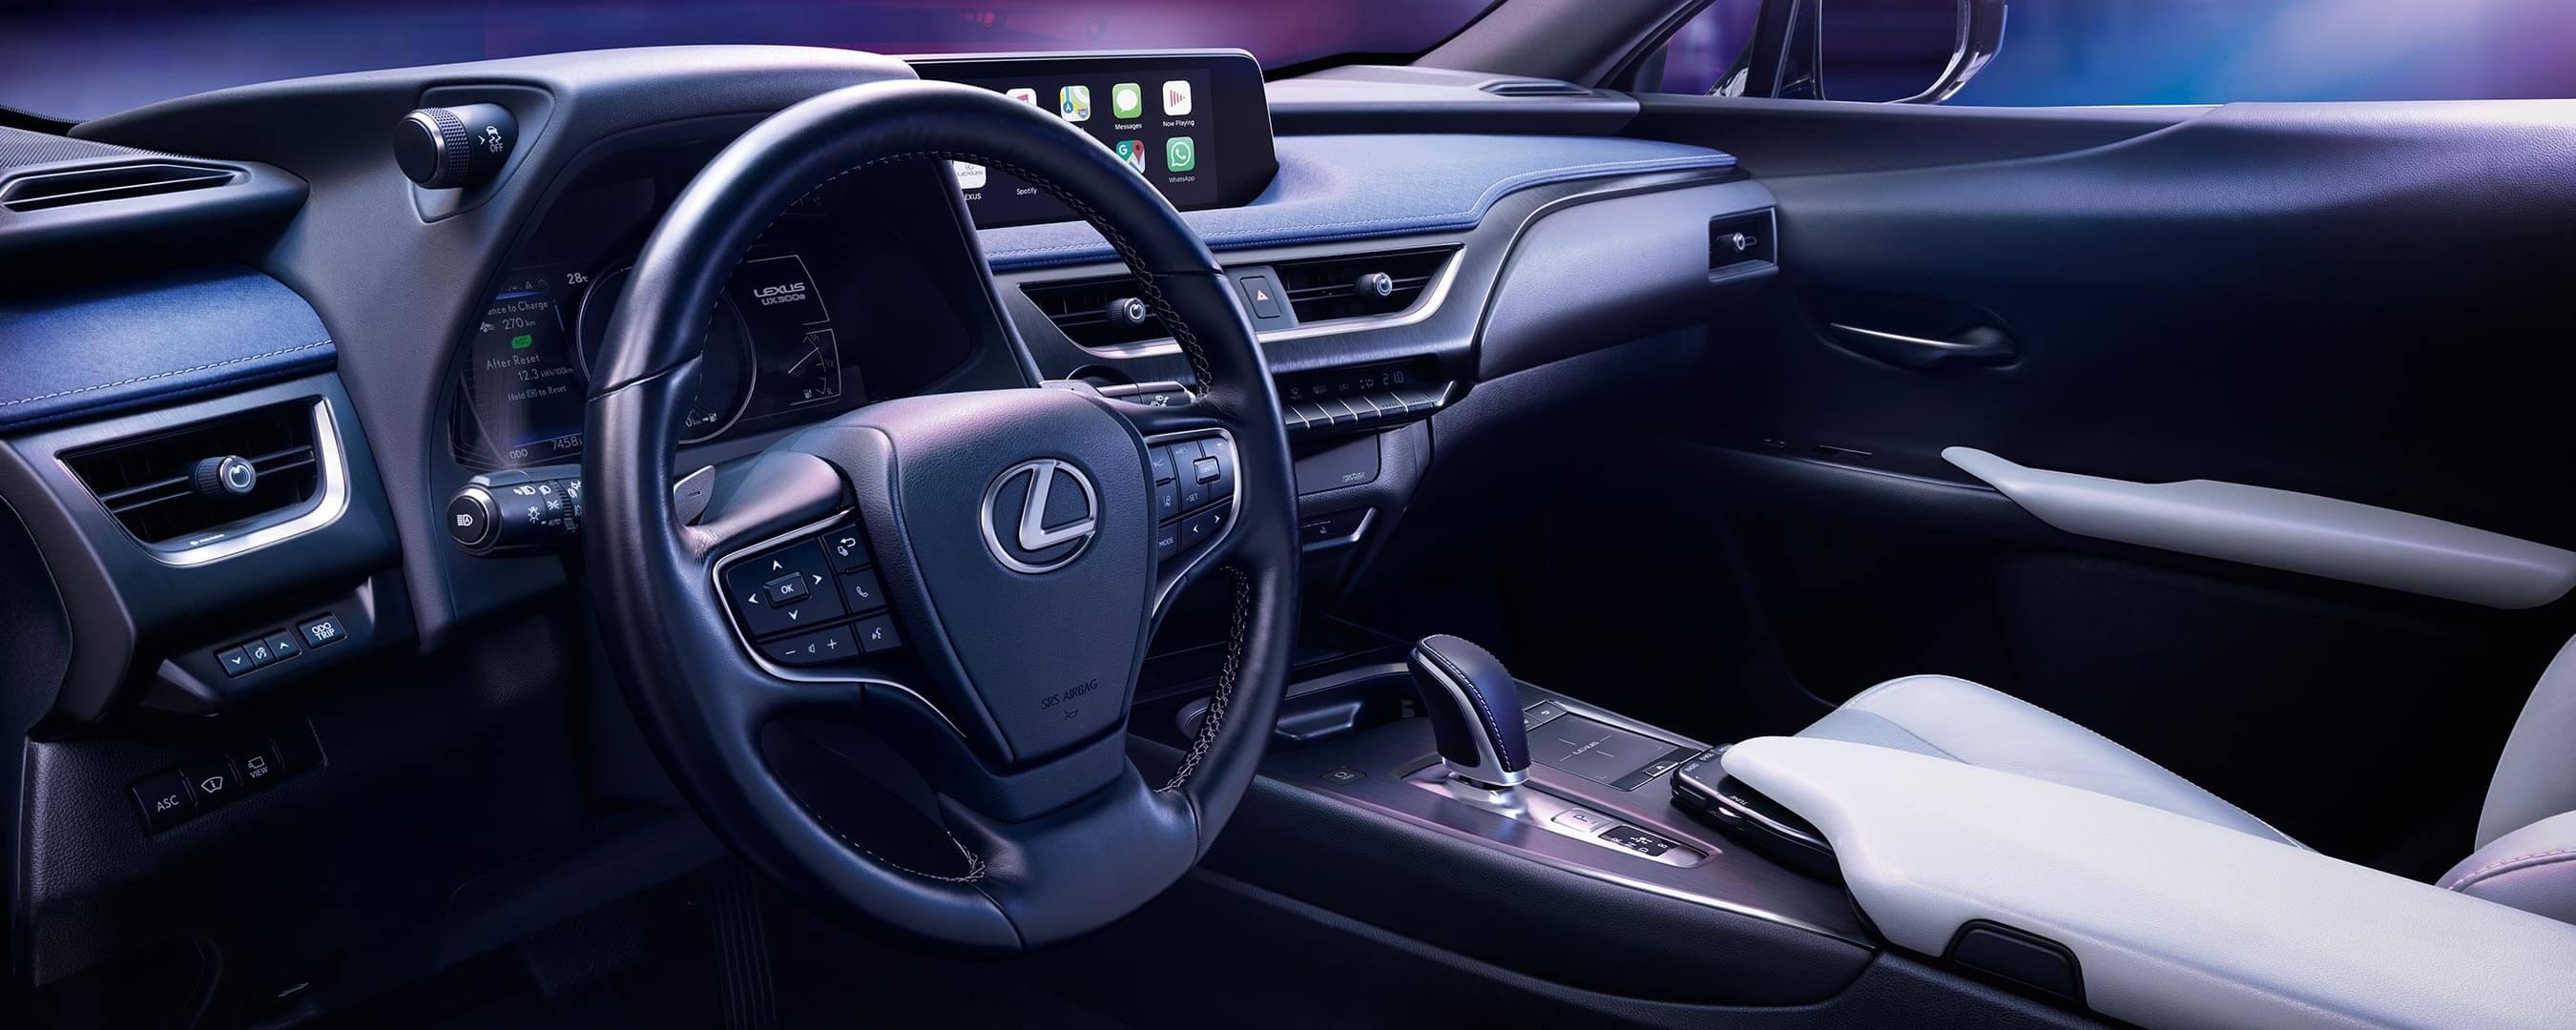 2020 lexus ux ev experience interior front